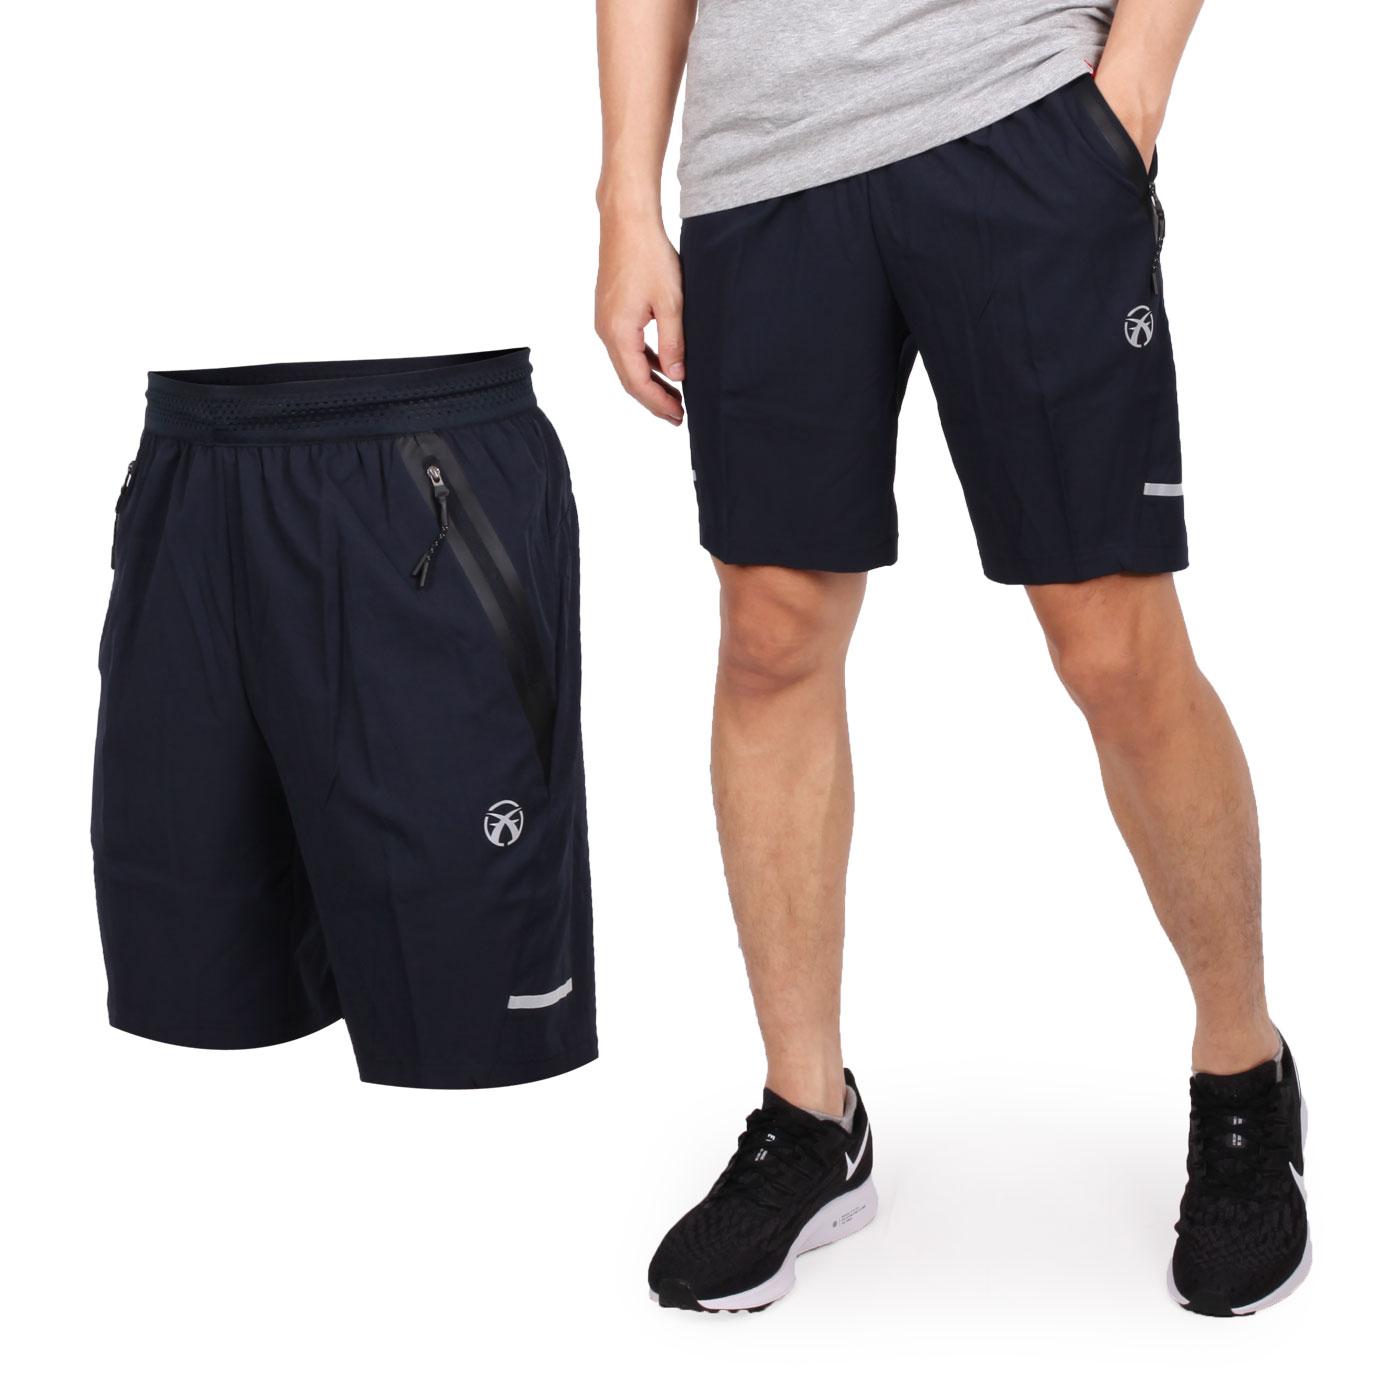 FIRESTAR 男彈性平織短褲 C9216-10 - 丈青銀